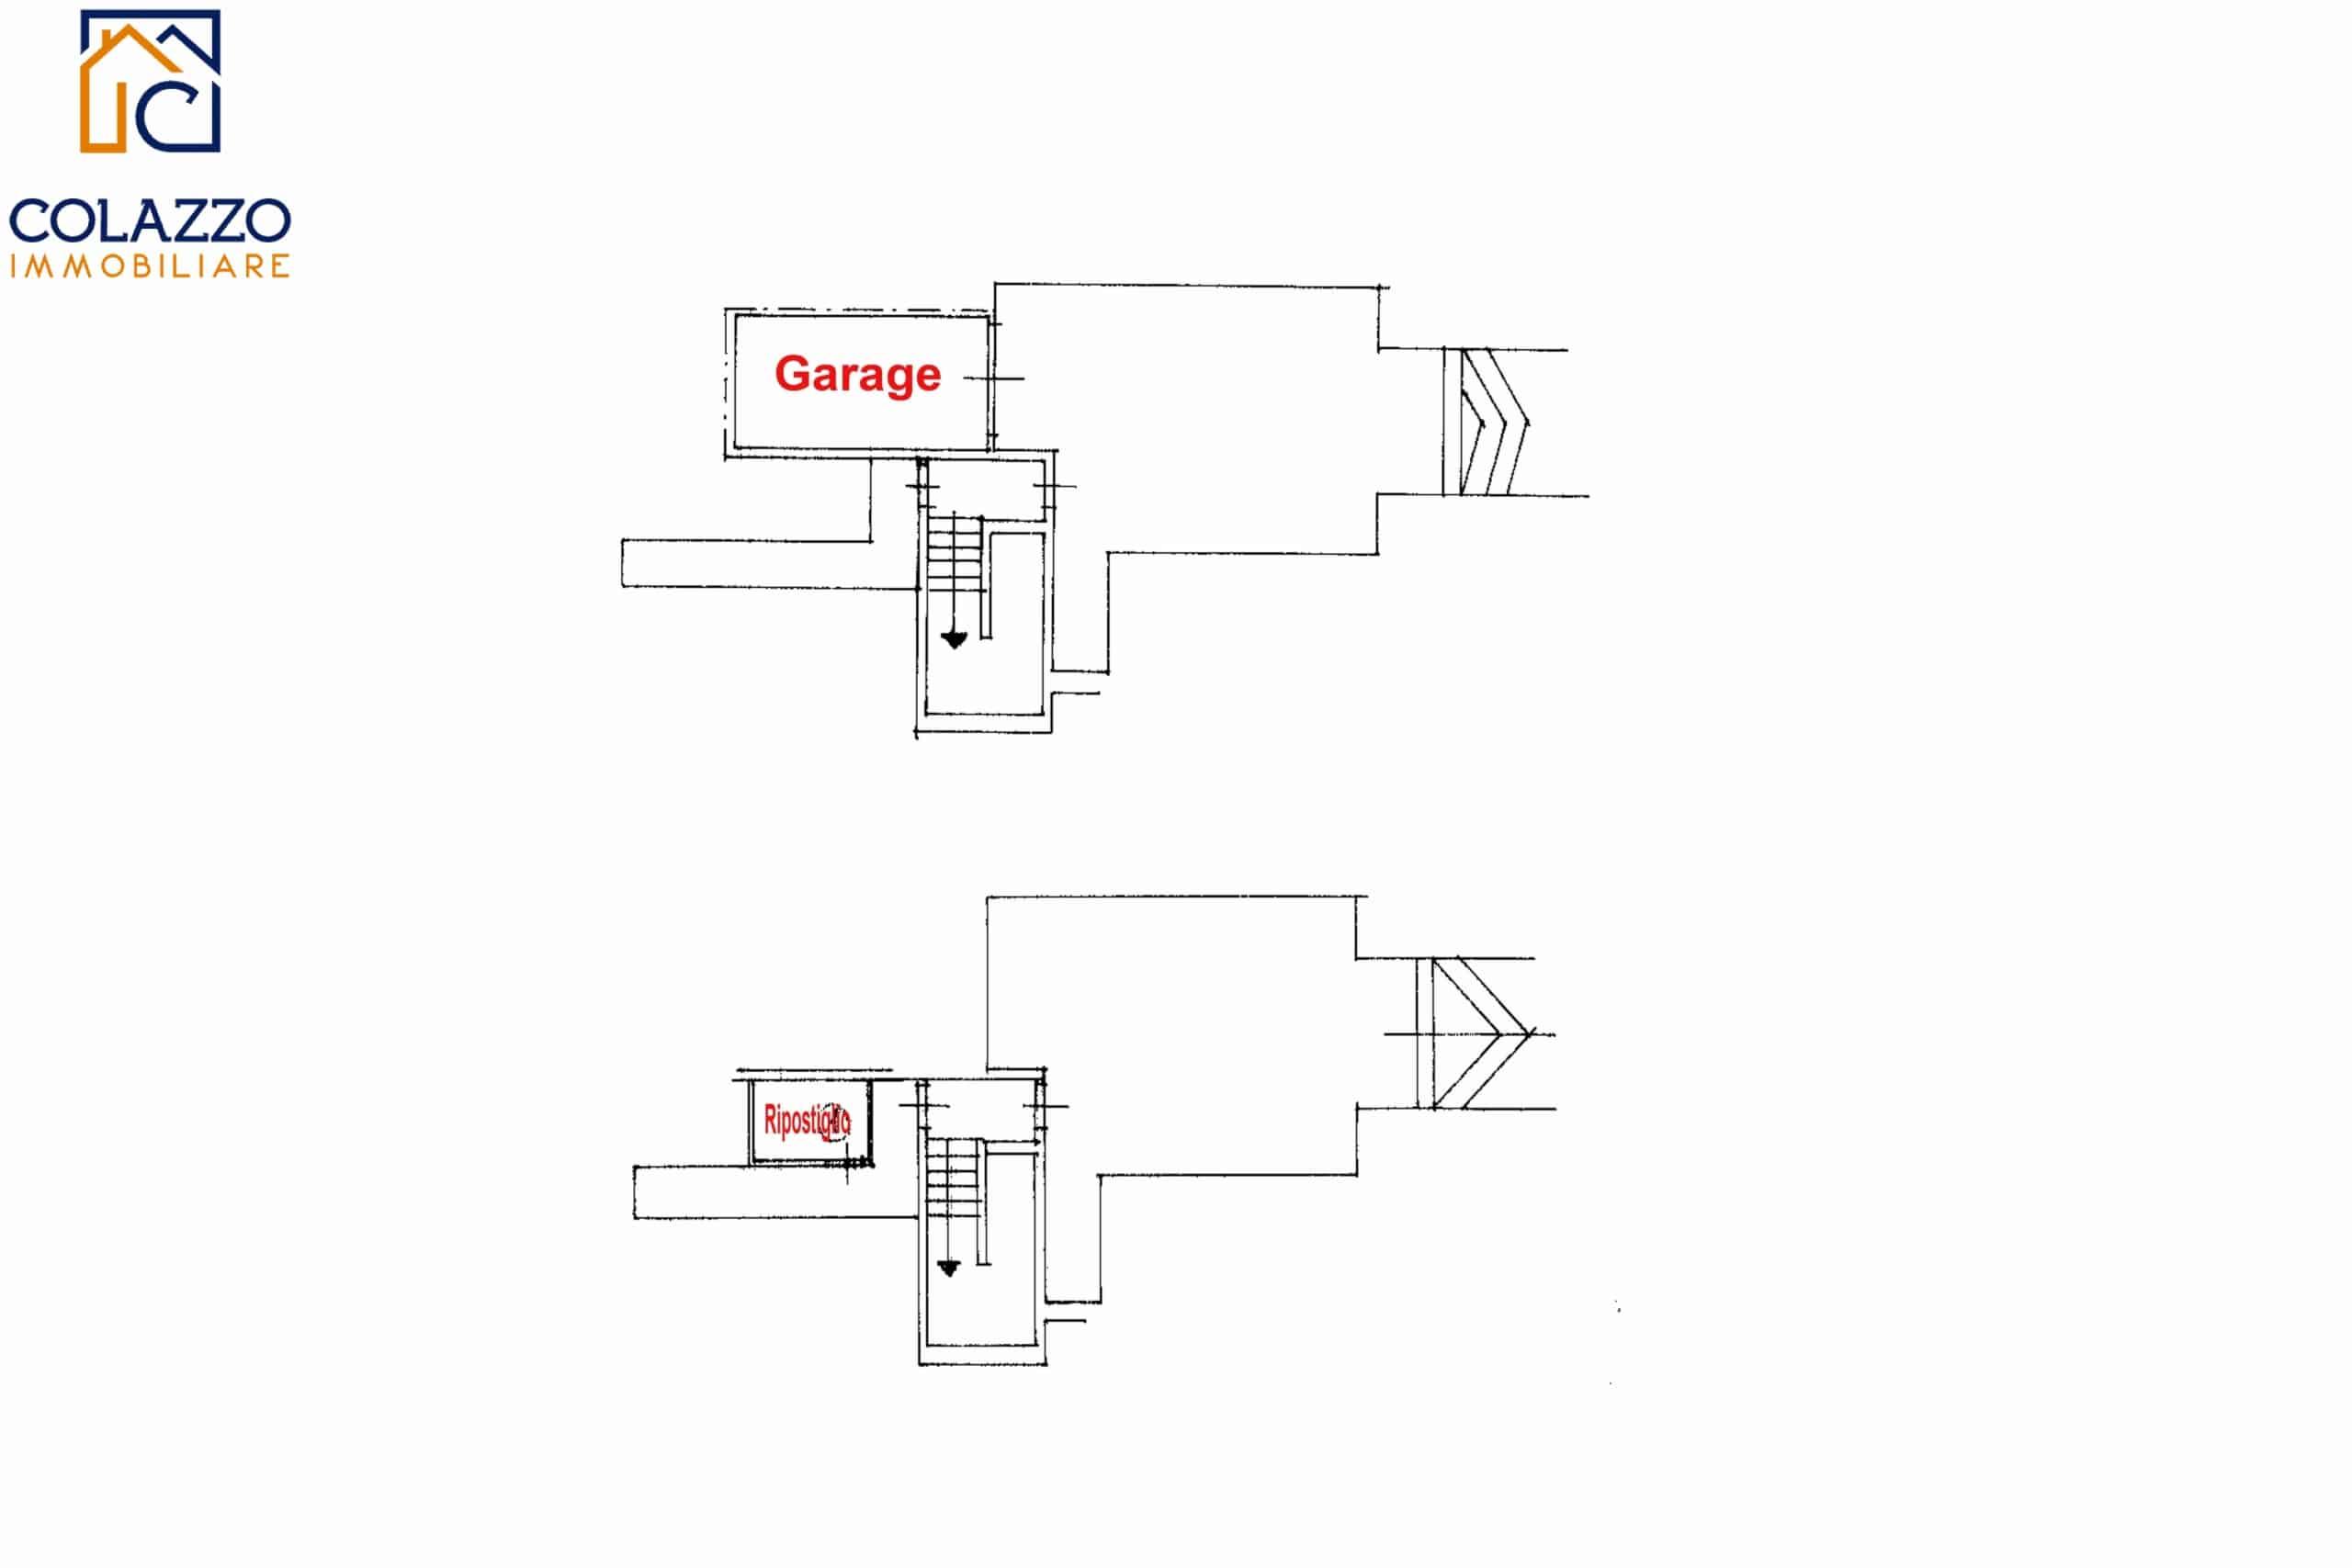 Planimetria Garage e Cantinola